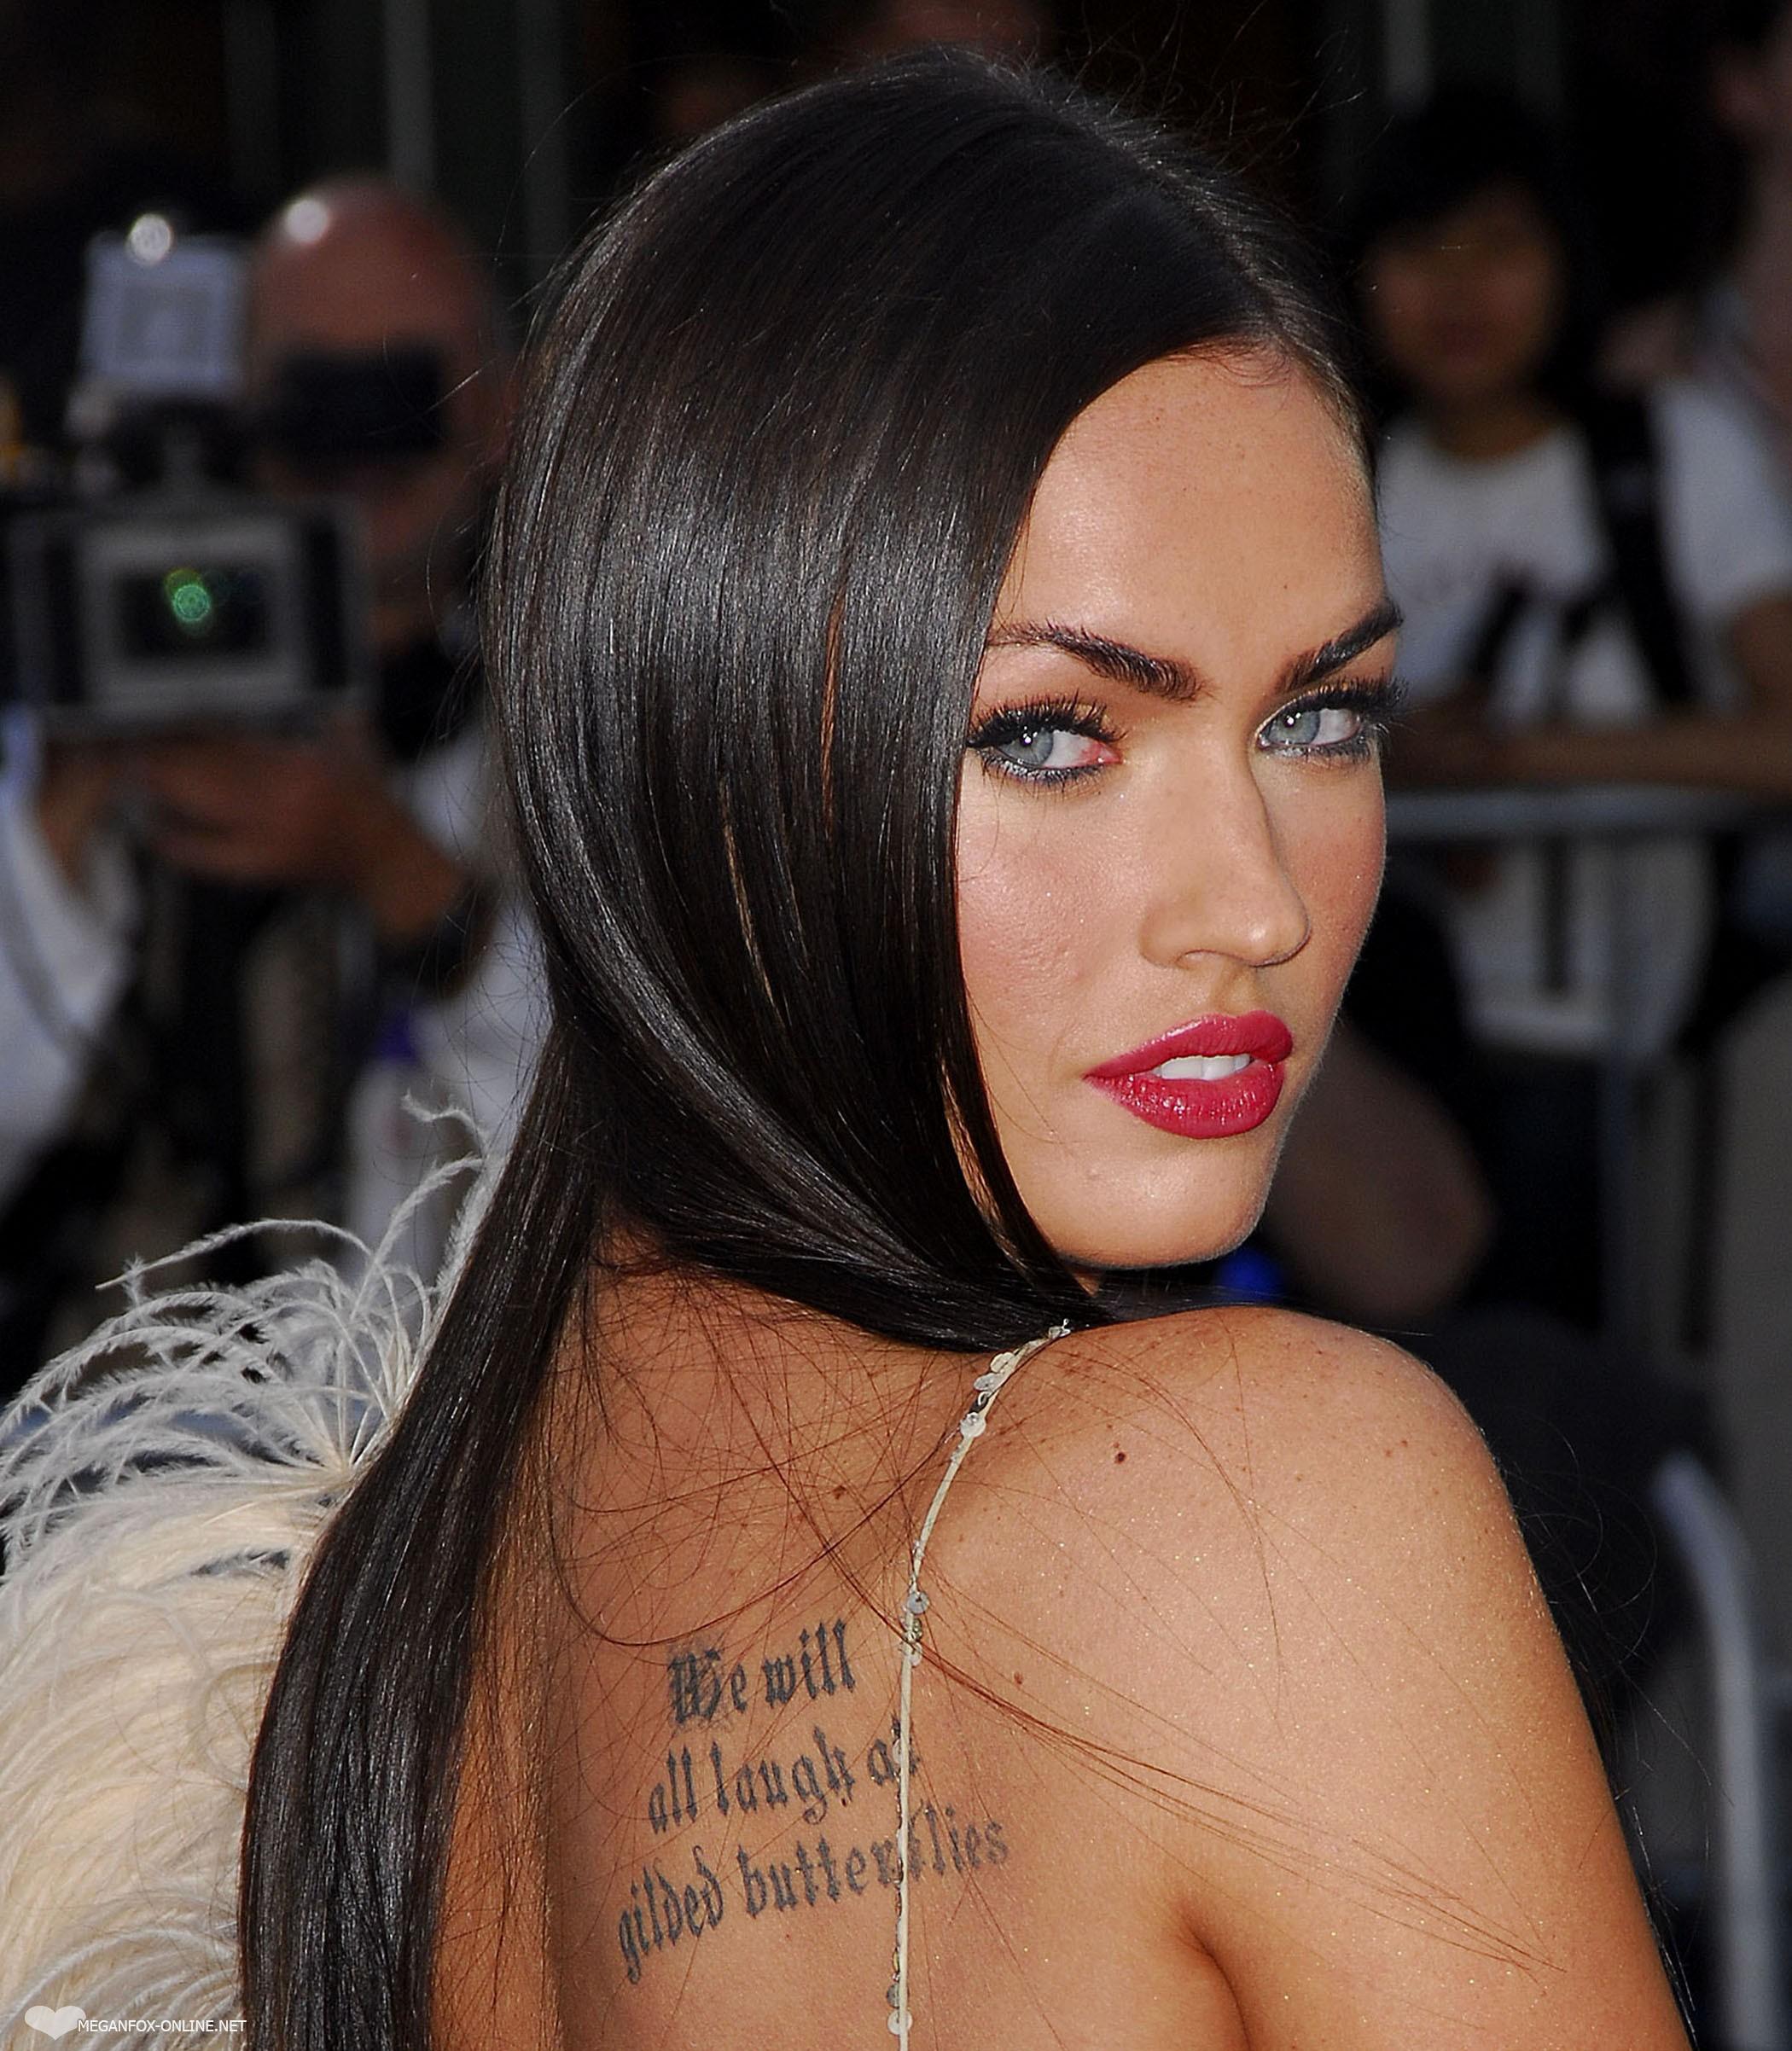 Фото татуировок звезд женщин